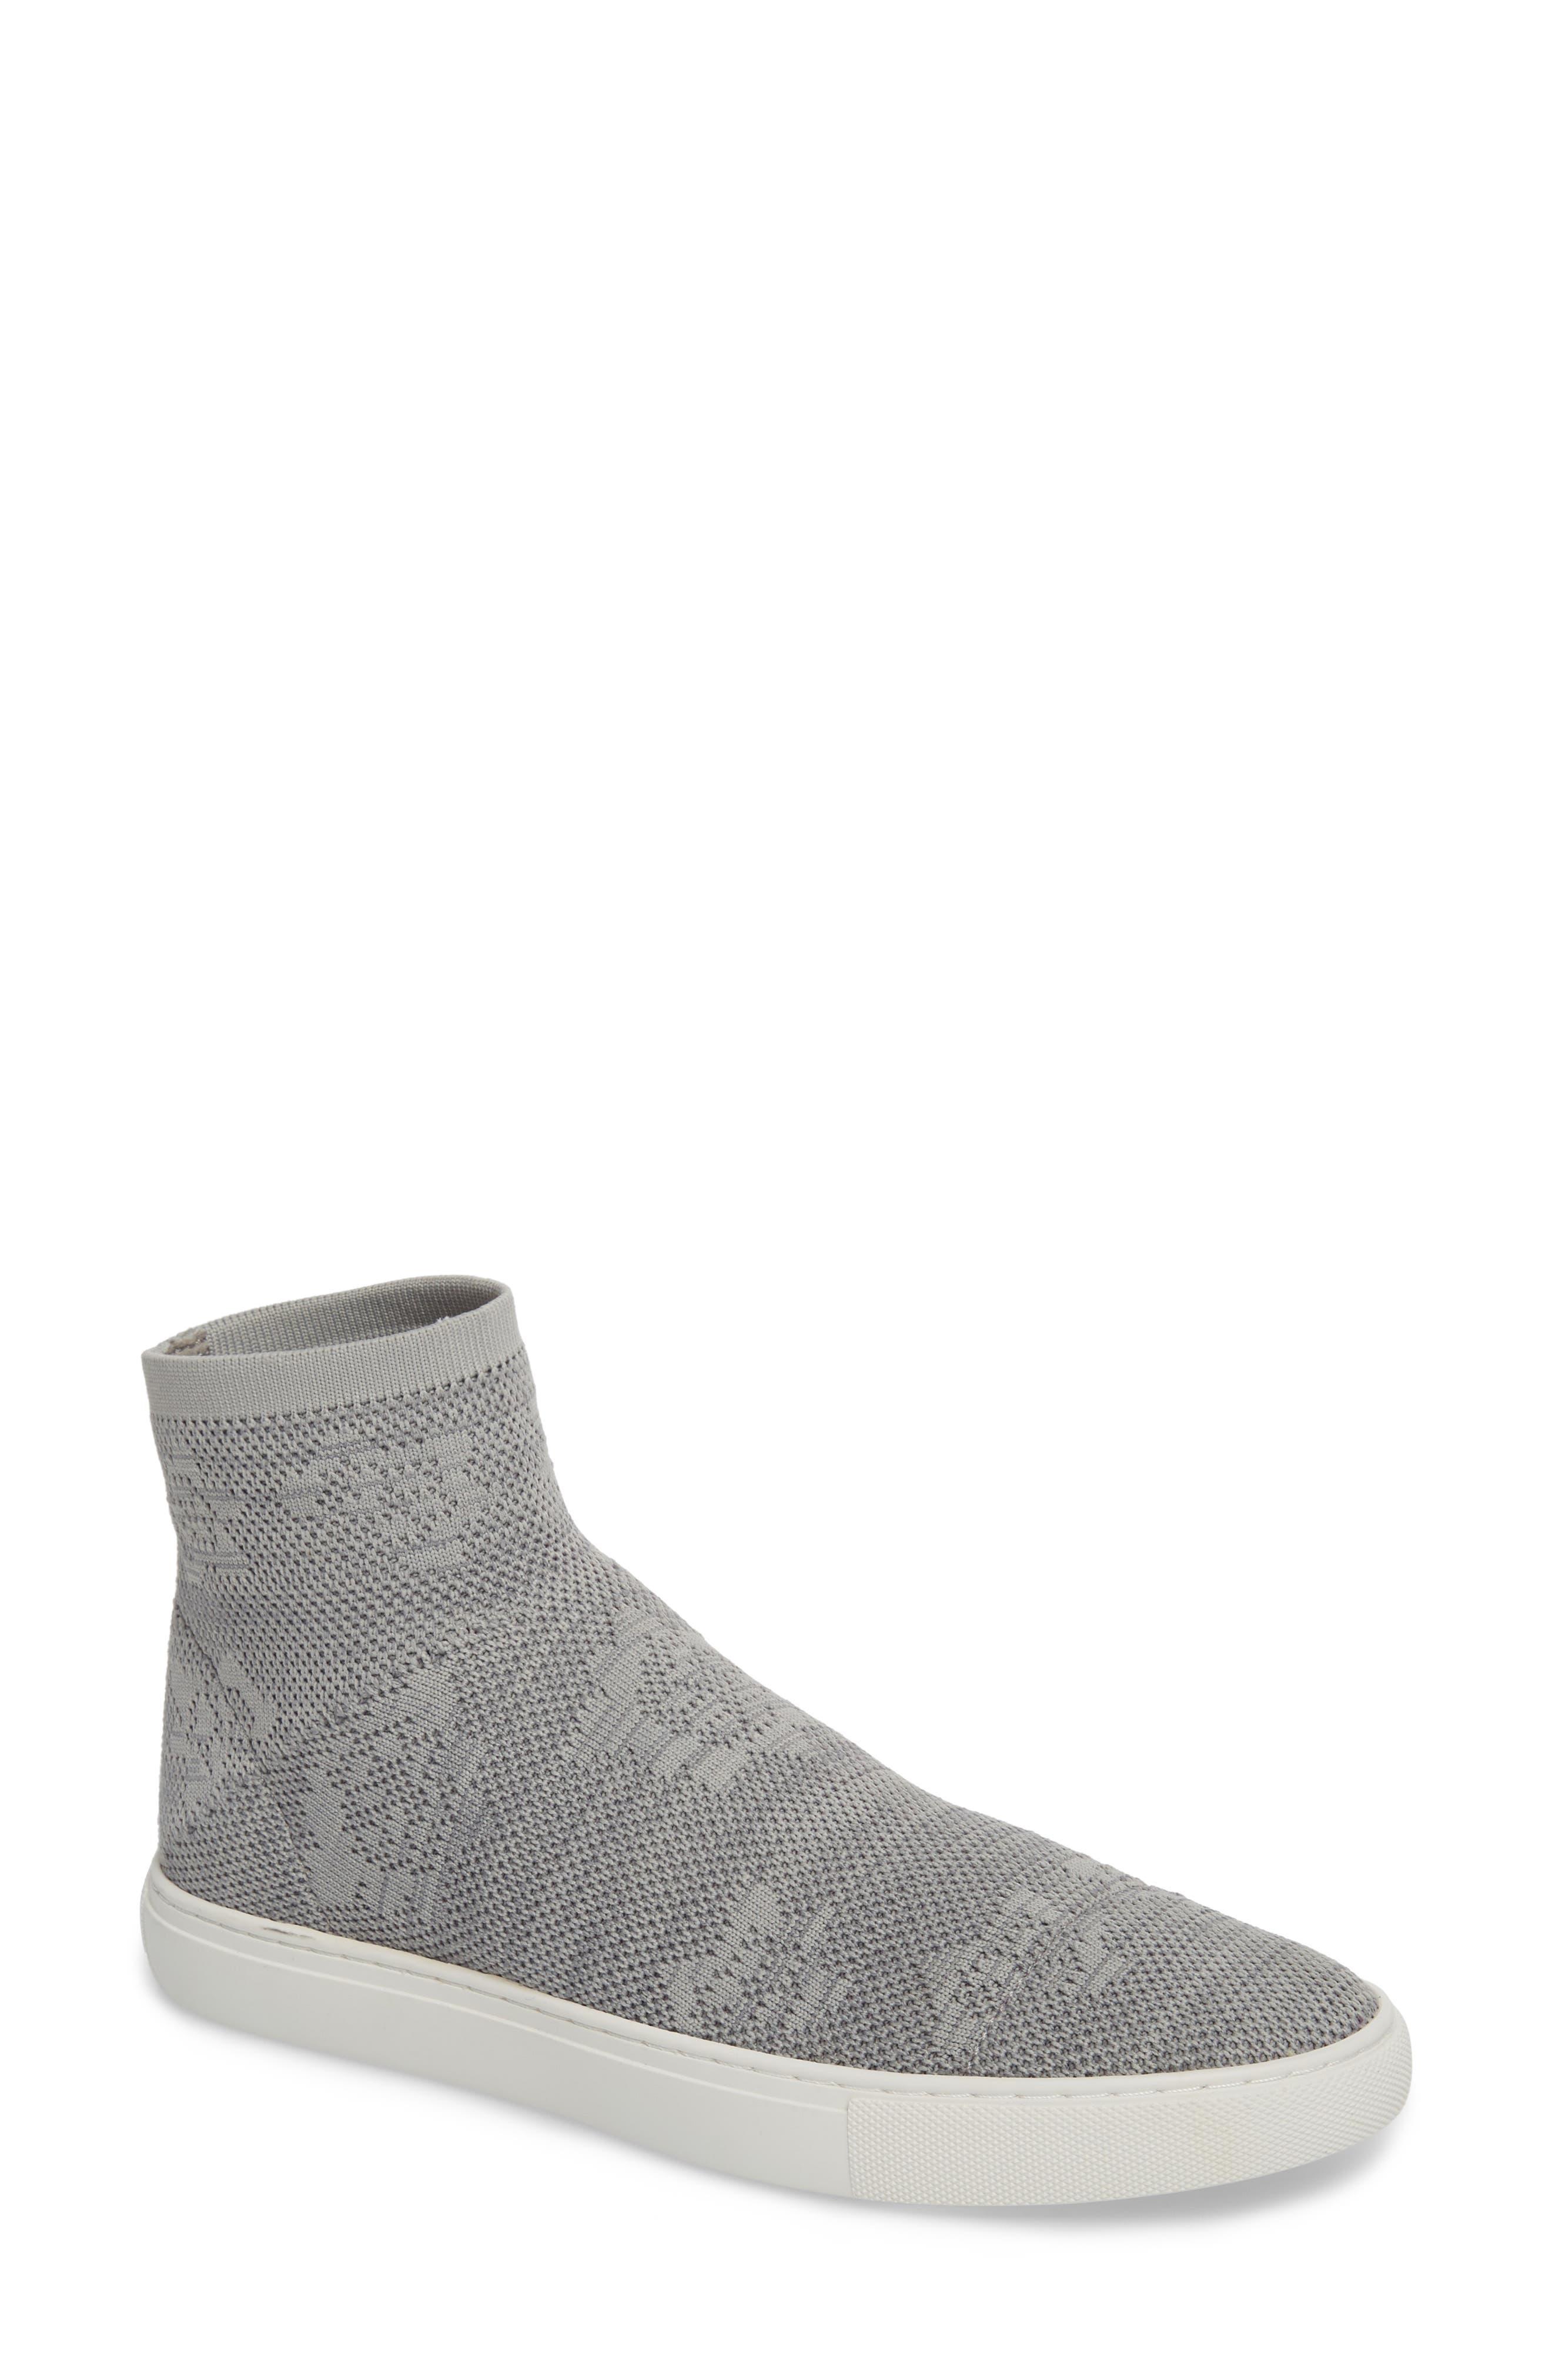 Keating Sneaker,                         Main,                         color, Dust Grey Fabric